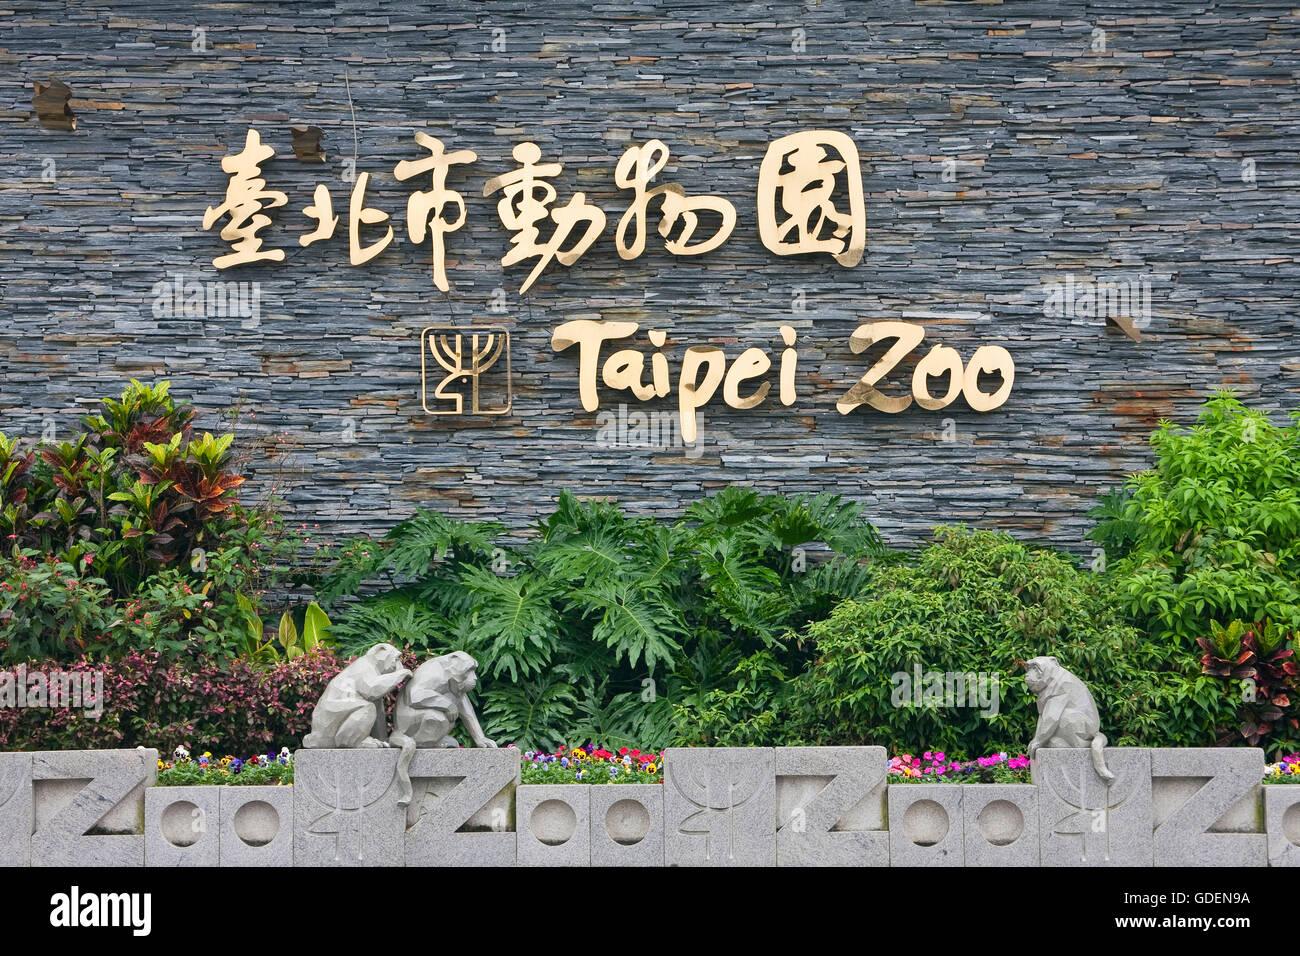 Entrance, zoo Taipeh, Taiwan - Stock Image